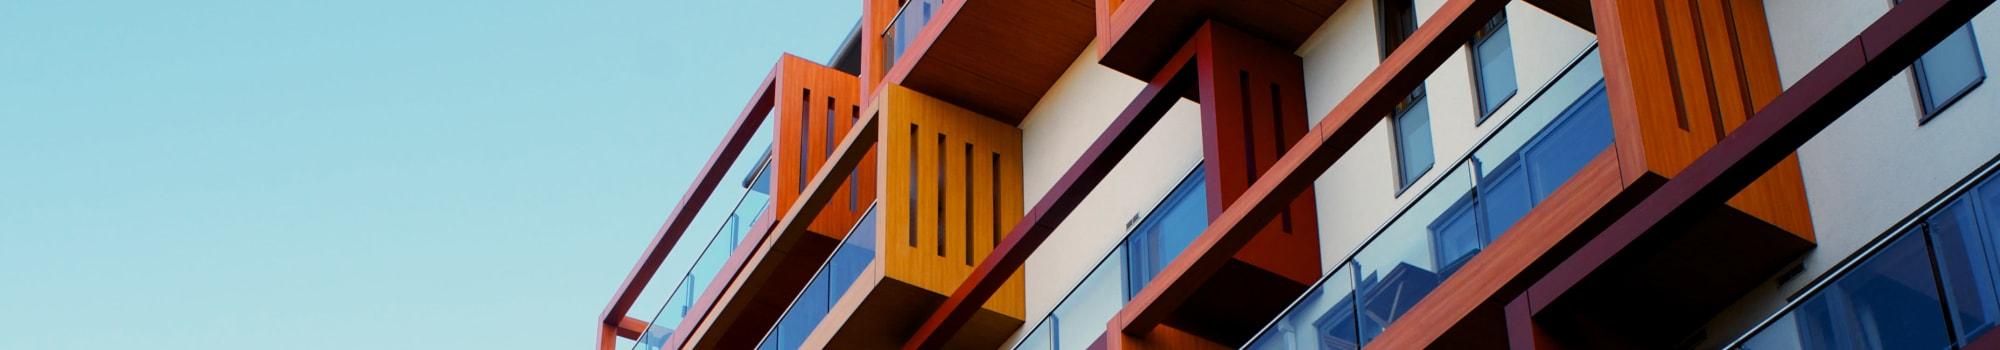 Maintenance Request of Elizabeth Cornish Landing & Annex Apartments in Bridgeville, Delaware